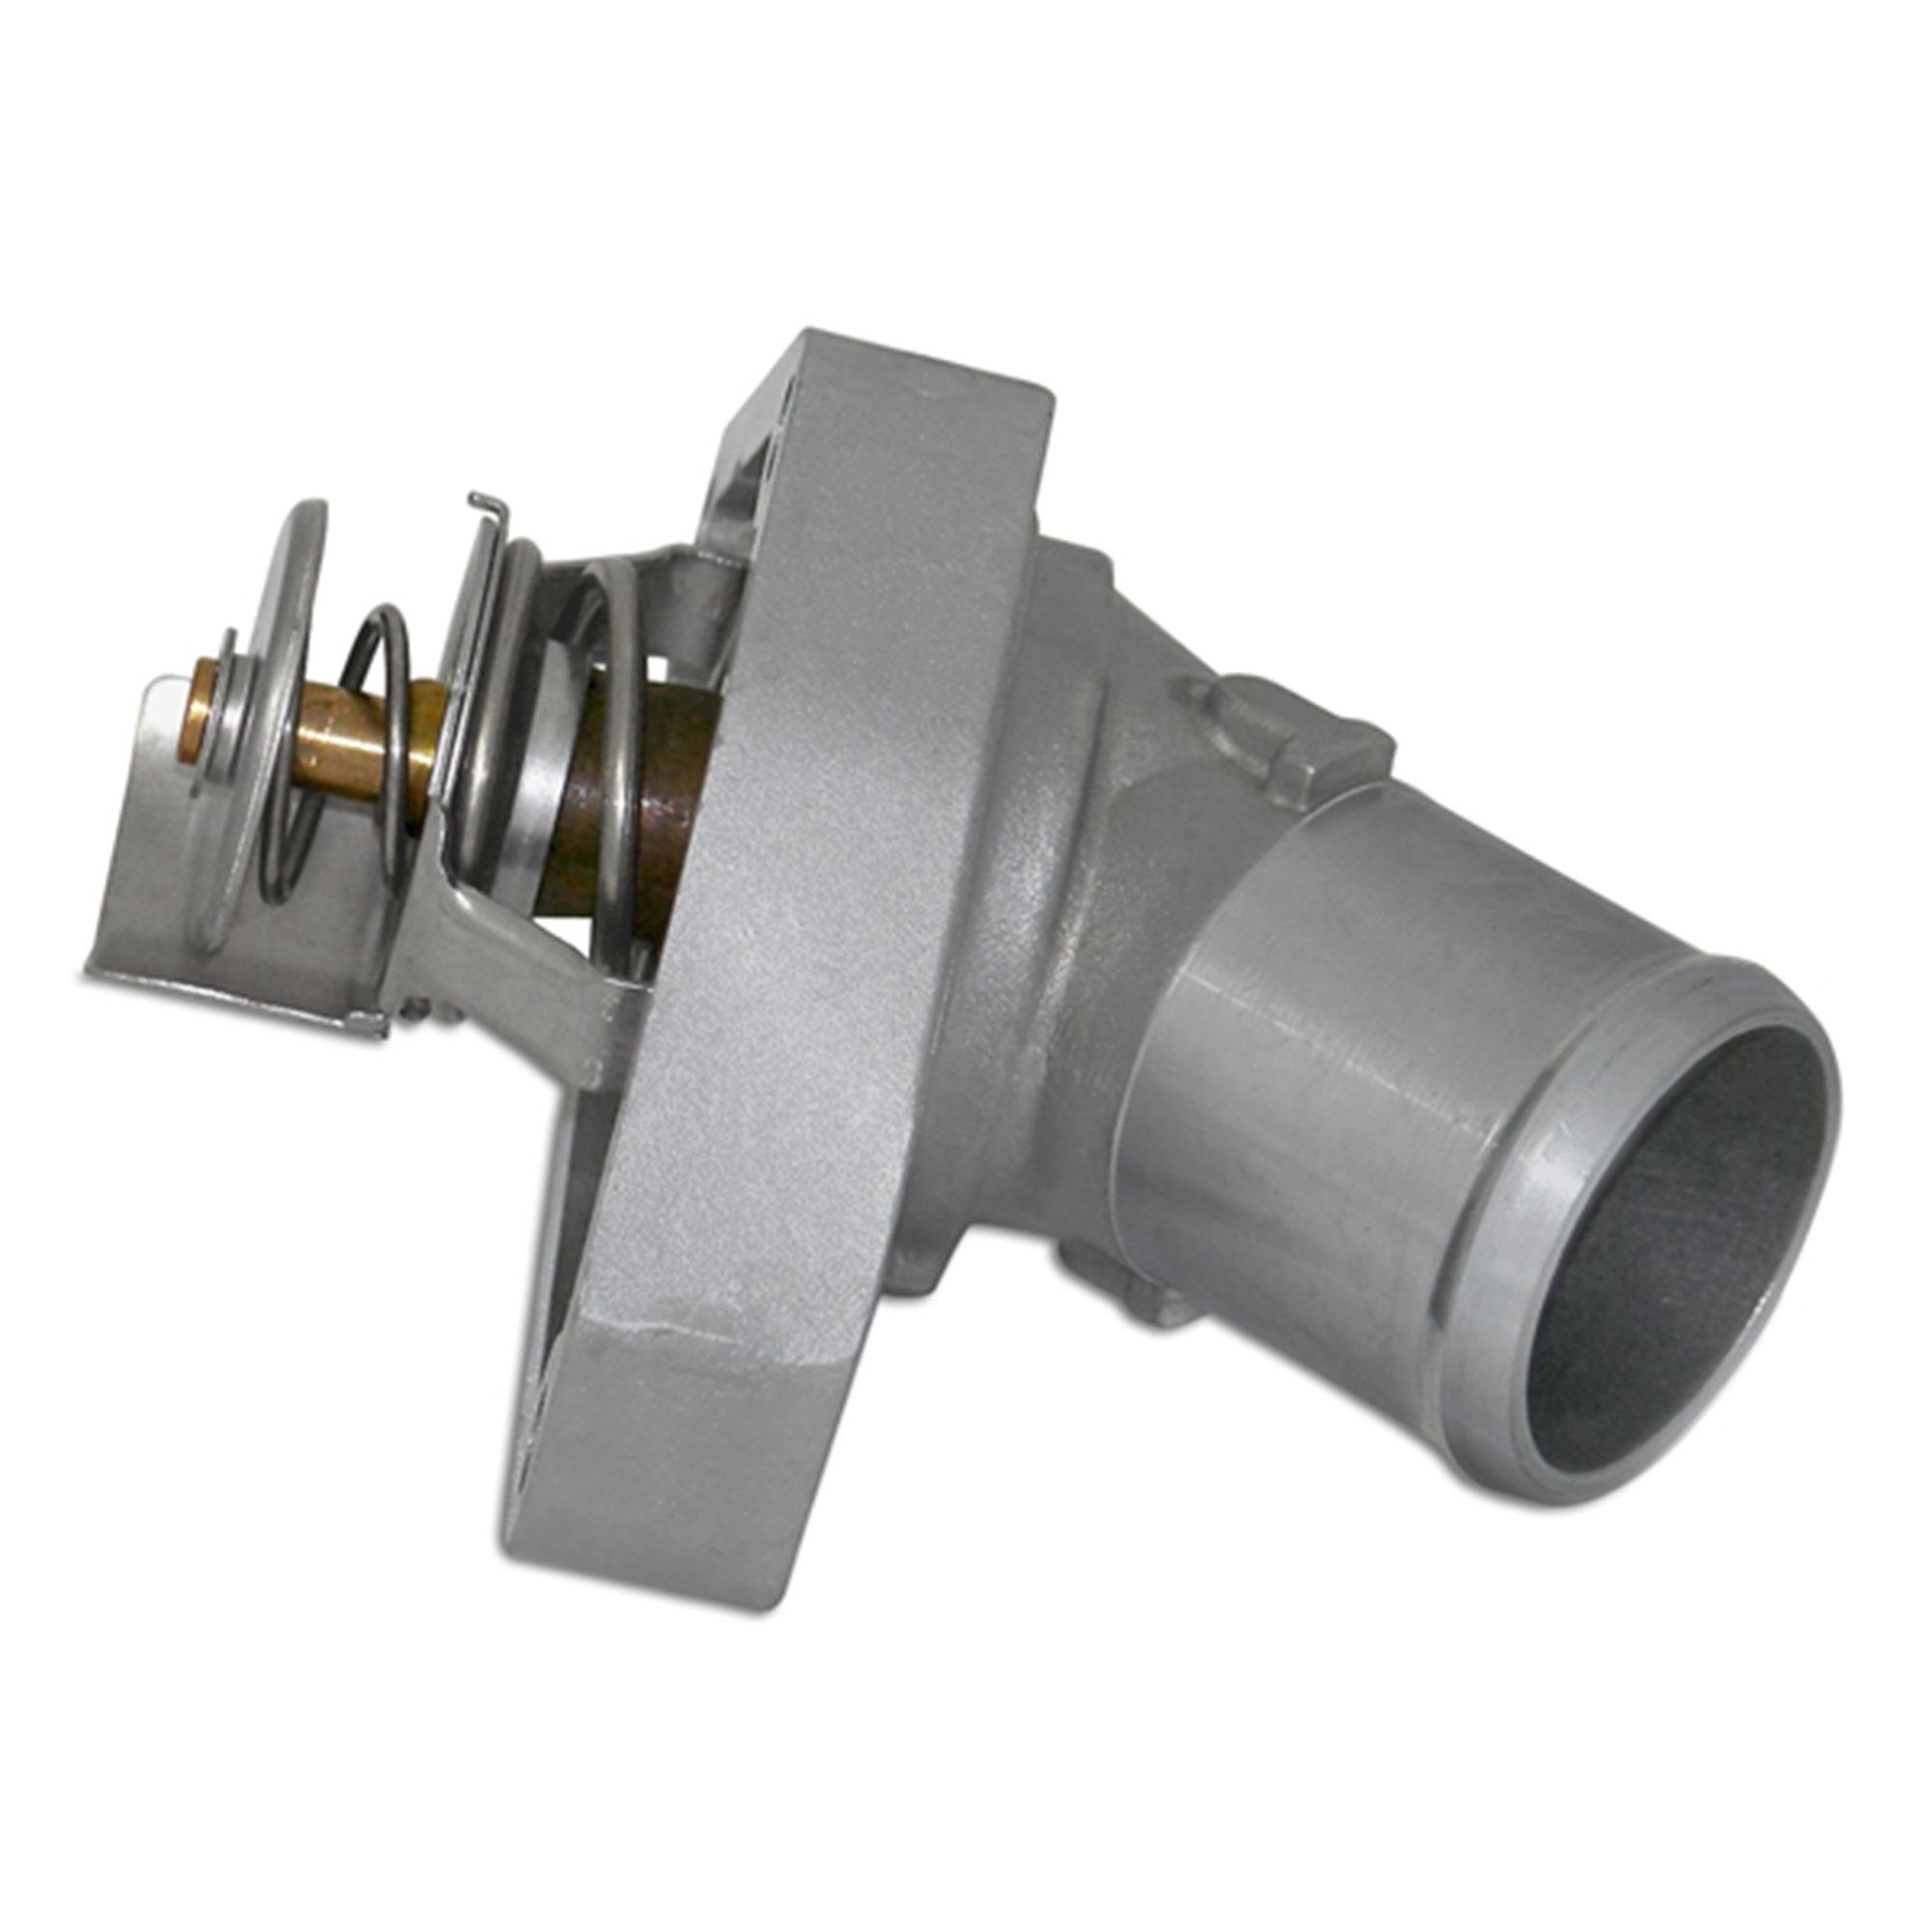 8x hydrostössel ventilstössel sortie-page phrase vw sharan 7m 1.8 t 20v